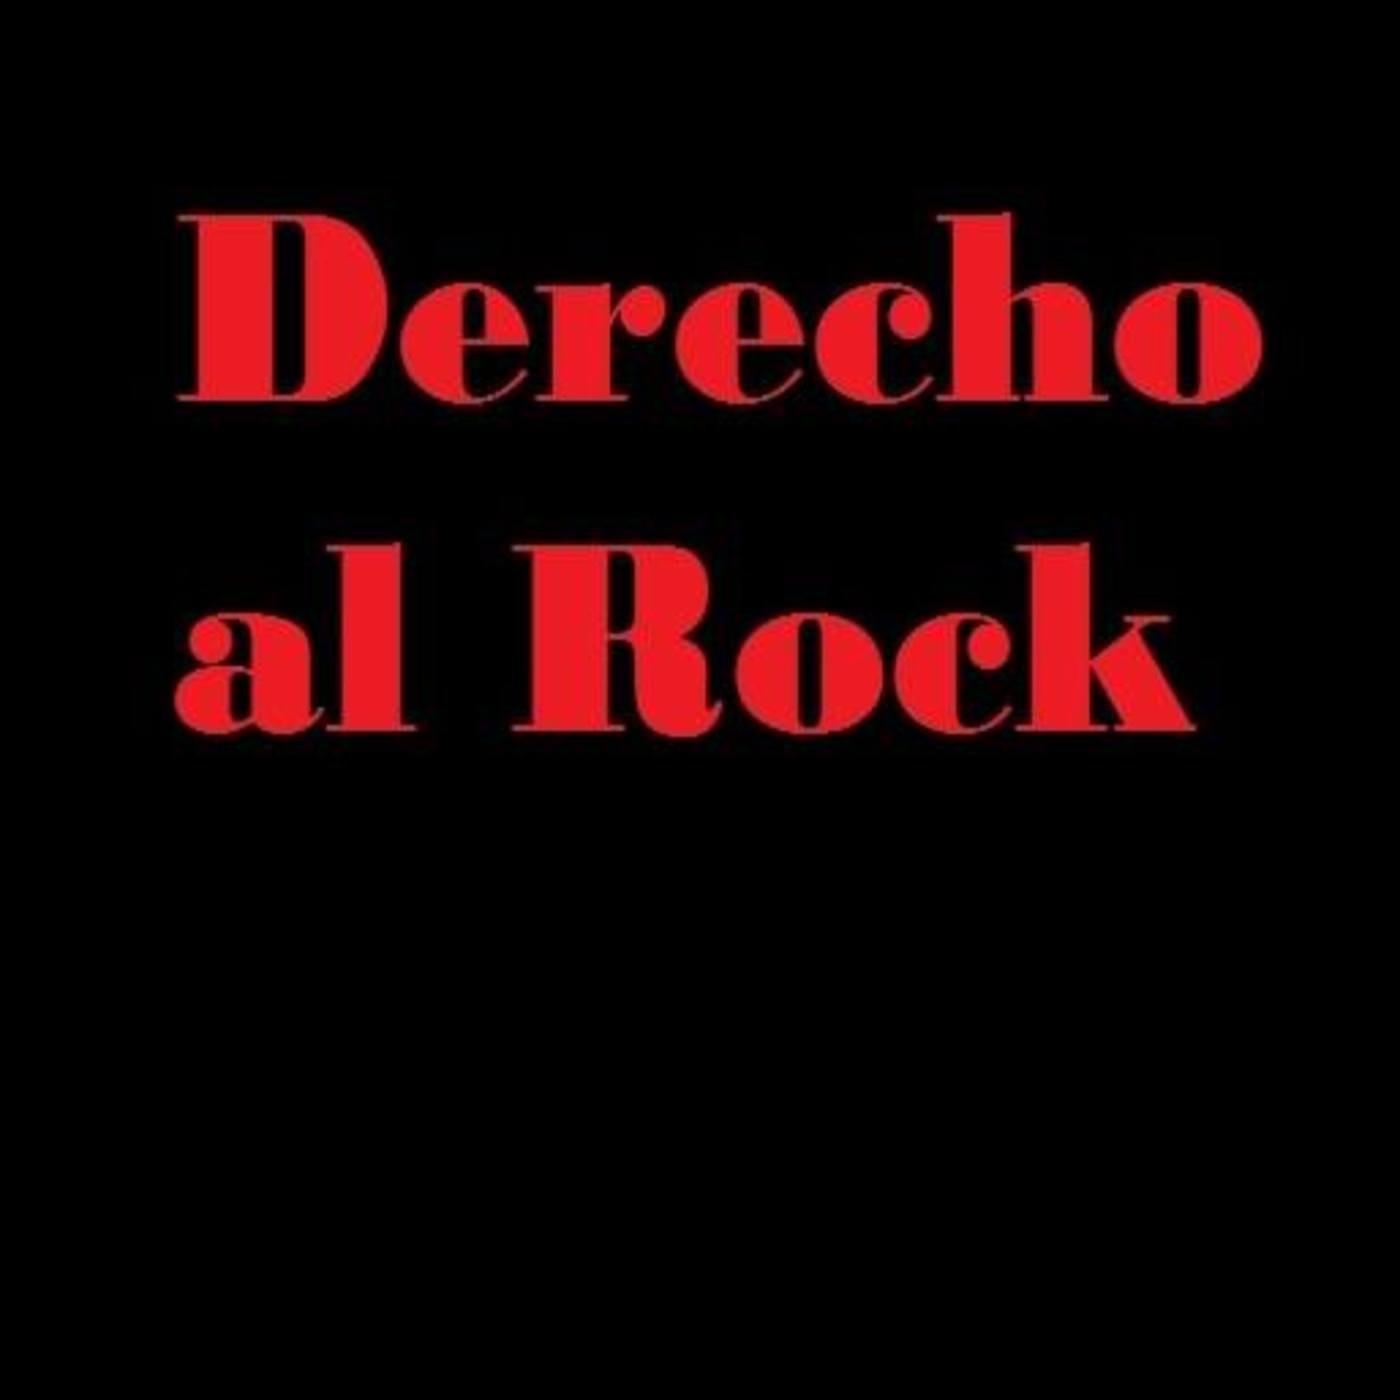 <![CDATA[Podcast de Derecho Al Rock]]>